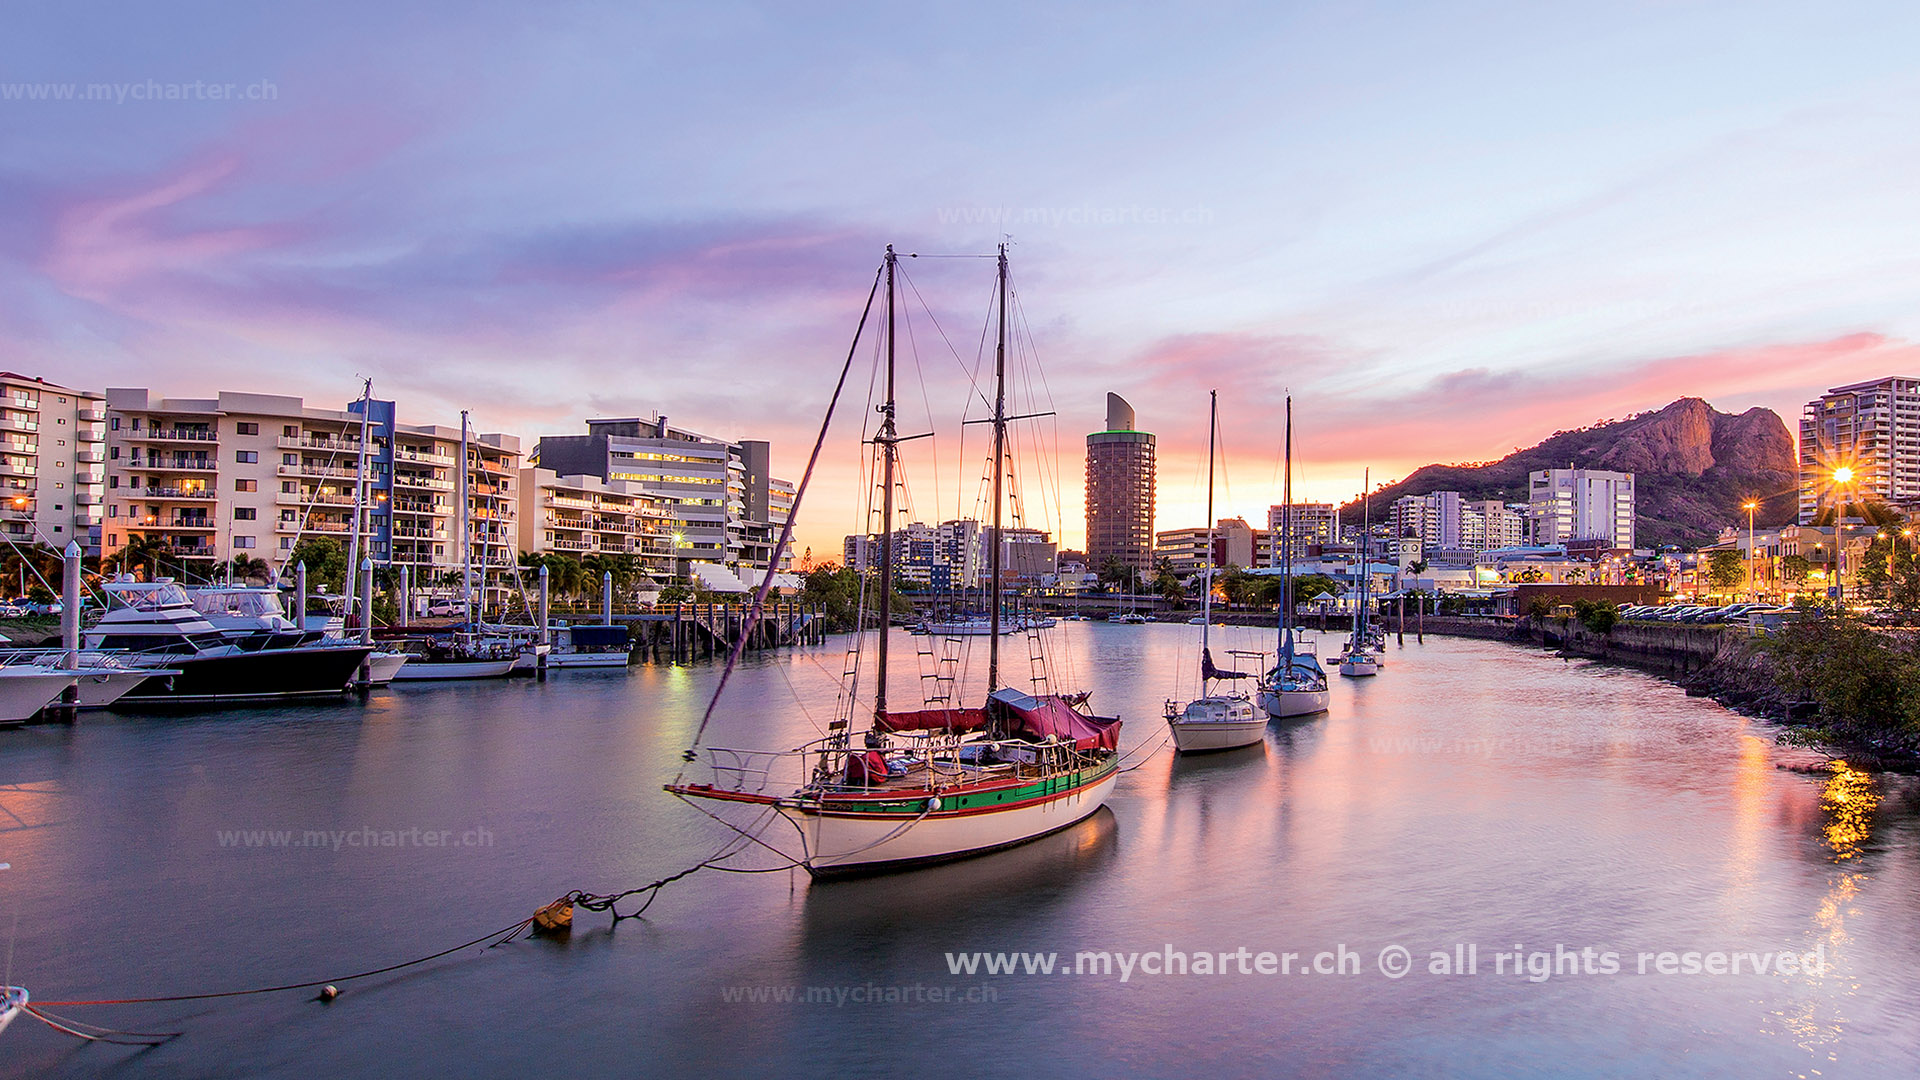 Yachtcharter Südesee - Australien - Townsville